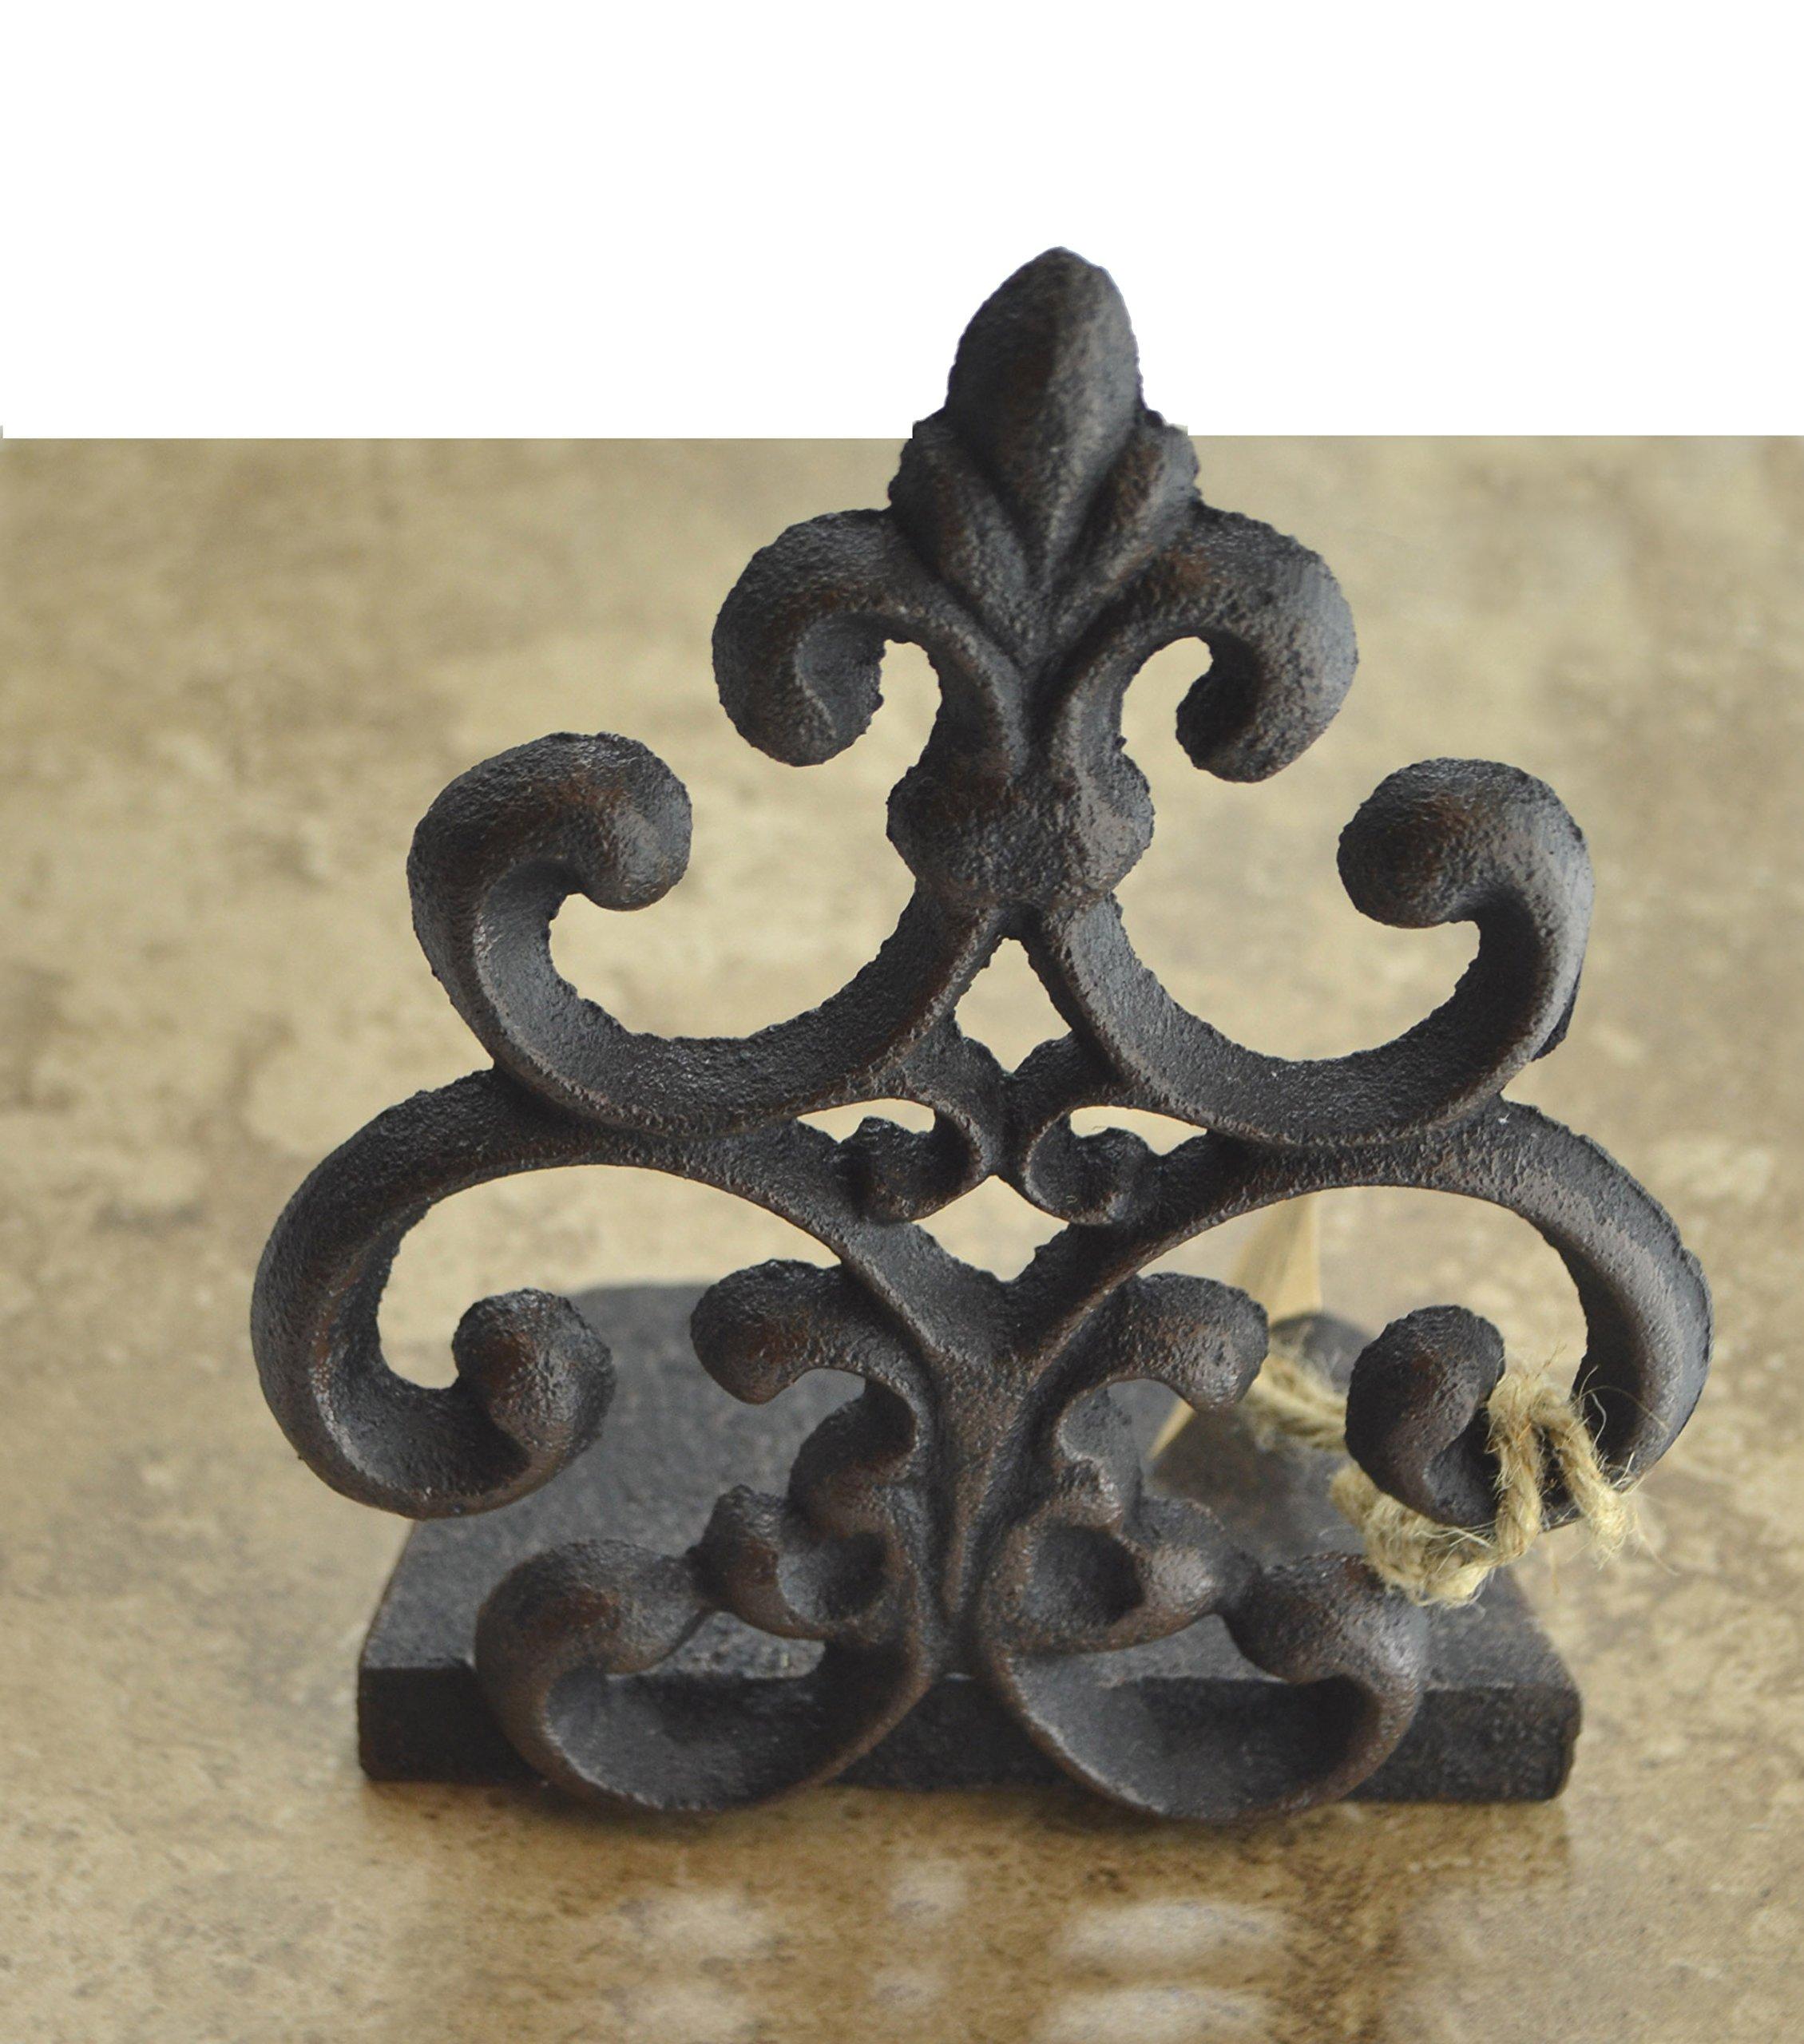 Lulu Decor, Cast Iron Fleur De Lis Door Stop, Door Stopper in Antique Black Finish, Beautiful and Useful Product (1) by Lulu Decor (Image #4)